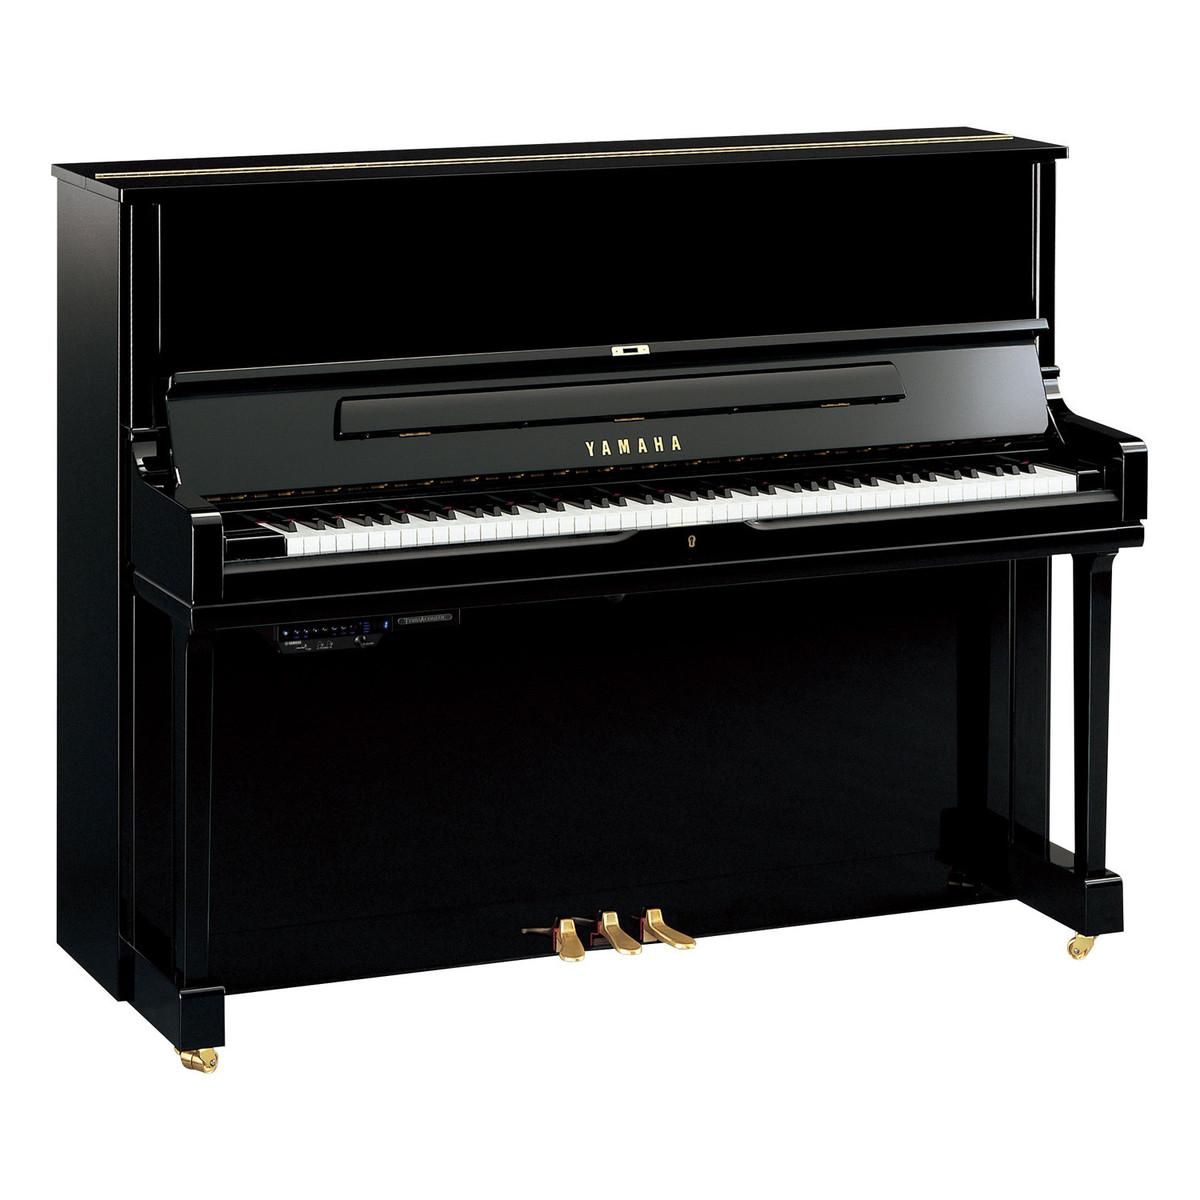 Yamaha TransAcoustic YUS1TA Pianoforte verticale ibrido a ...